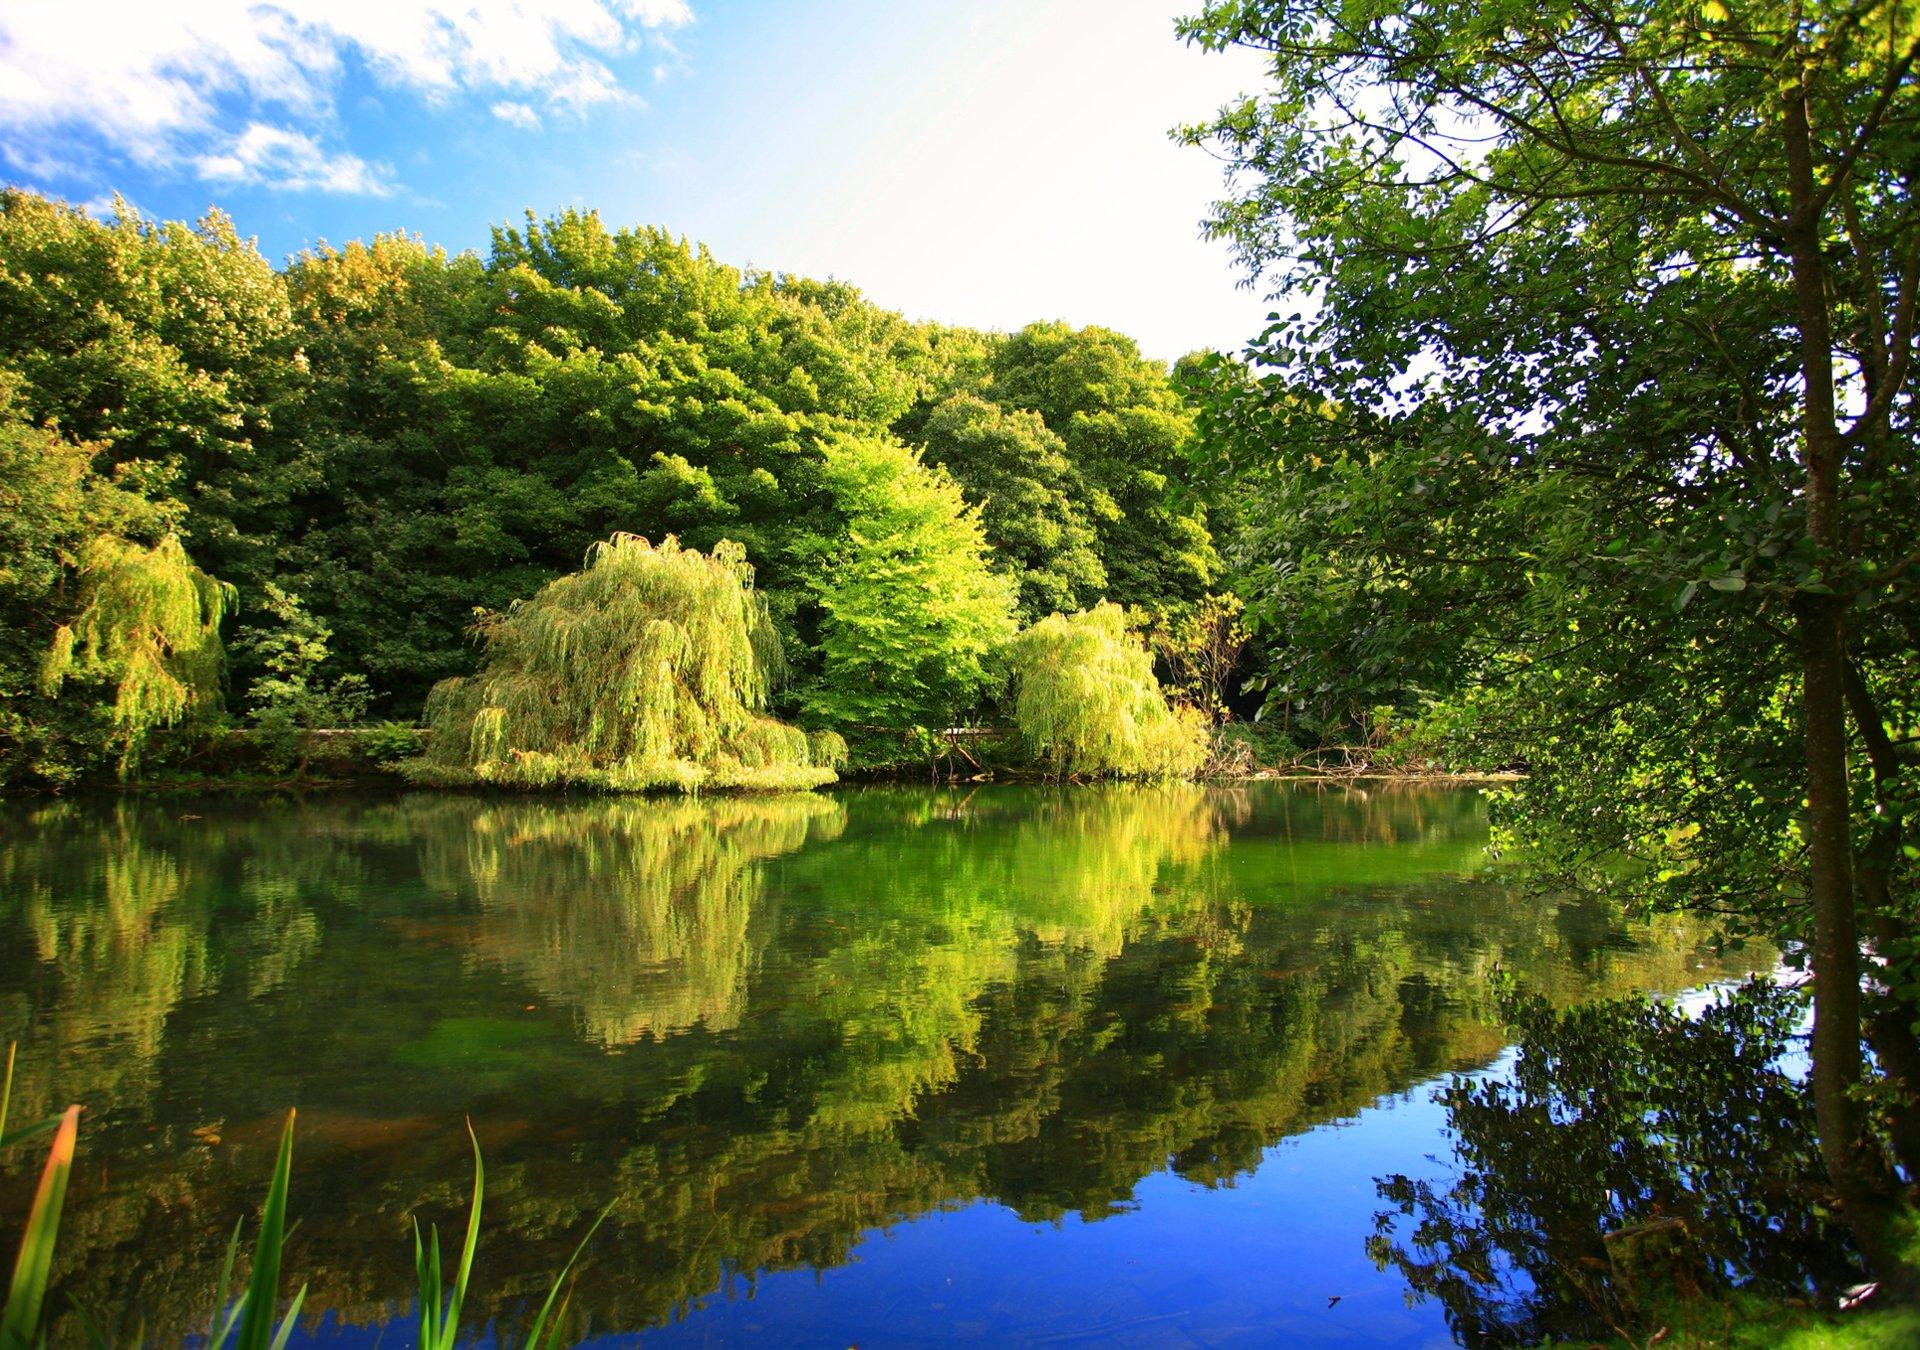 фото деревья и река на рабочий стол фото видно место